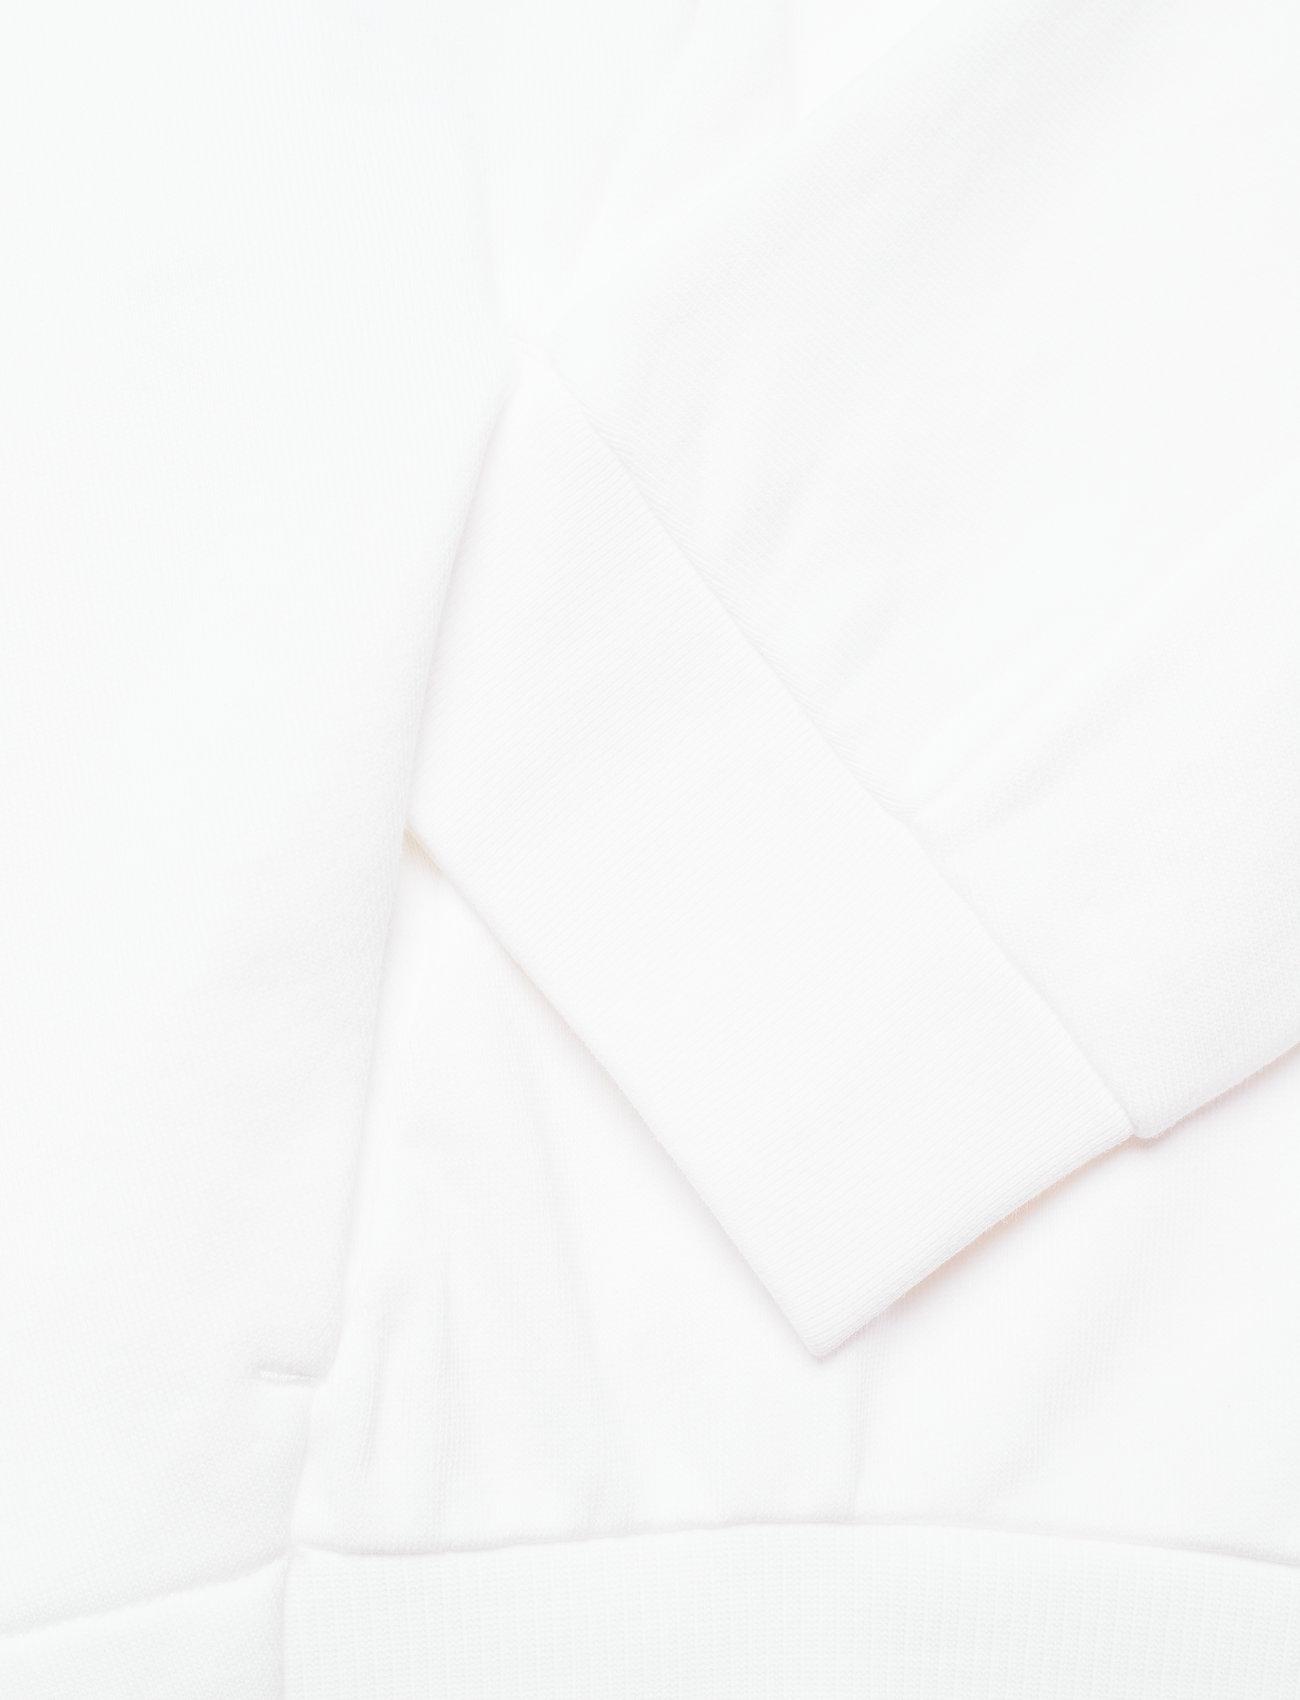 Max Mara Leisure - FRINE - sweatshirts & hoodies - optical white - 3